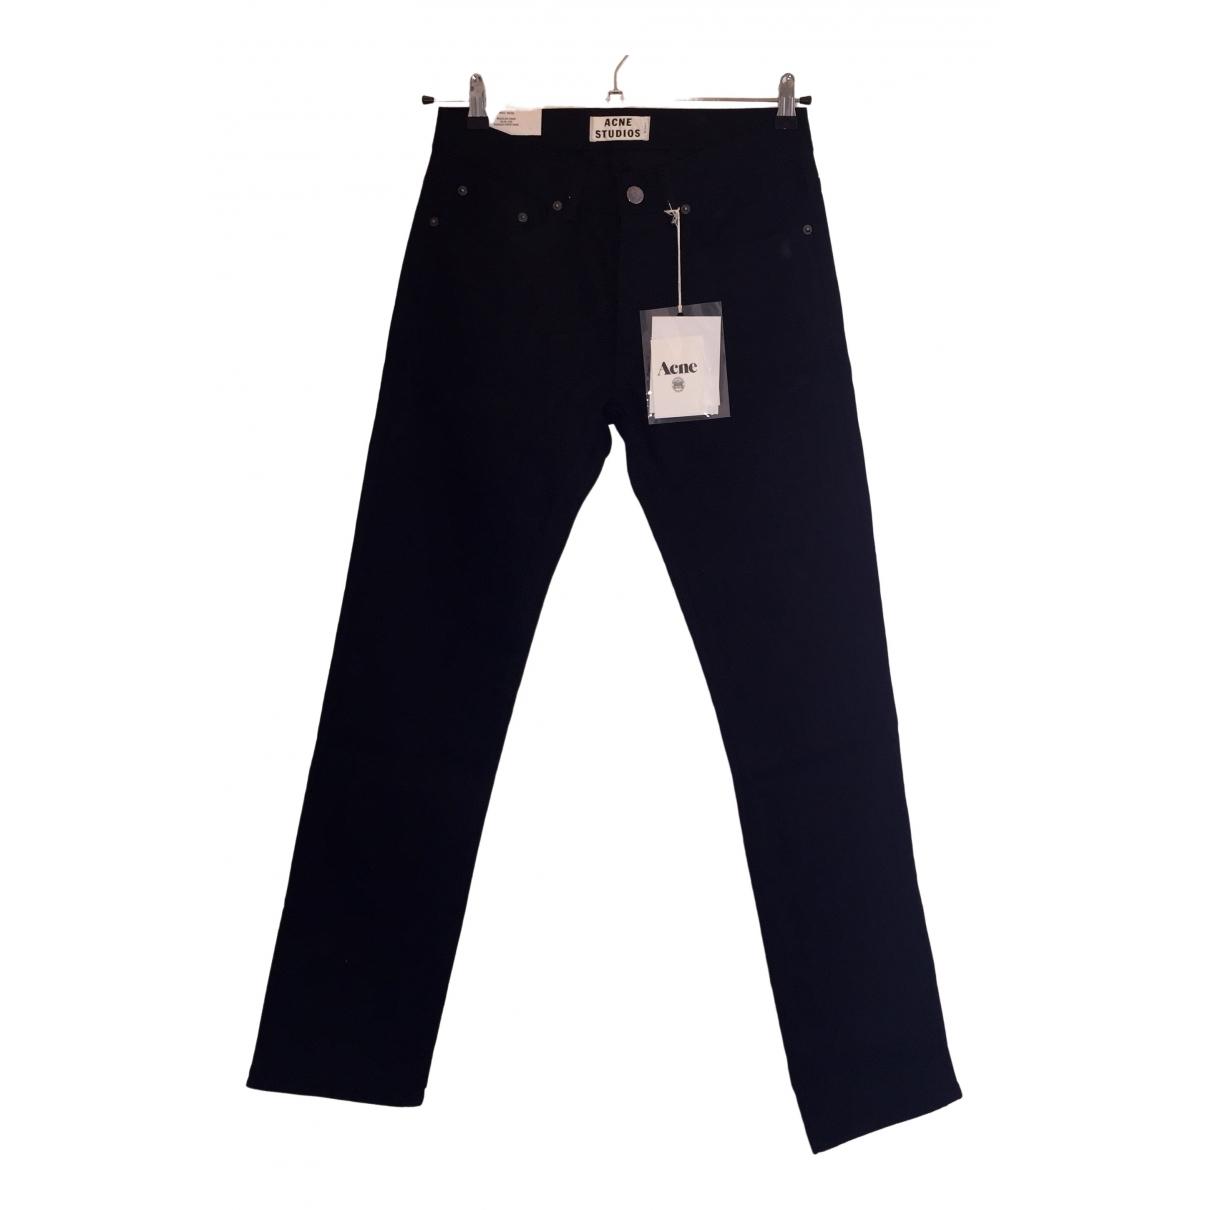 Acne Studios \N Black Denim - Jeans Trousers for Men 30 UK - US